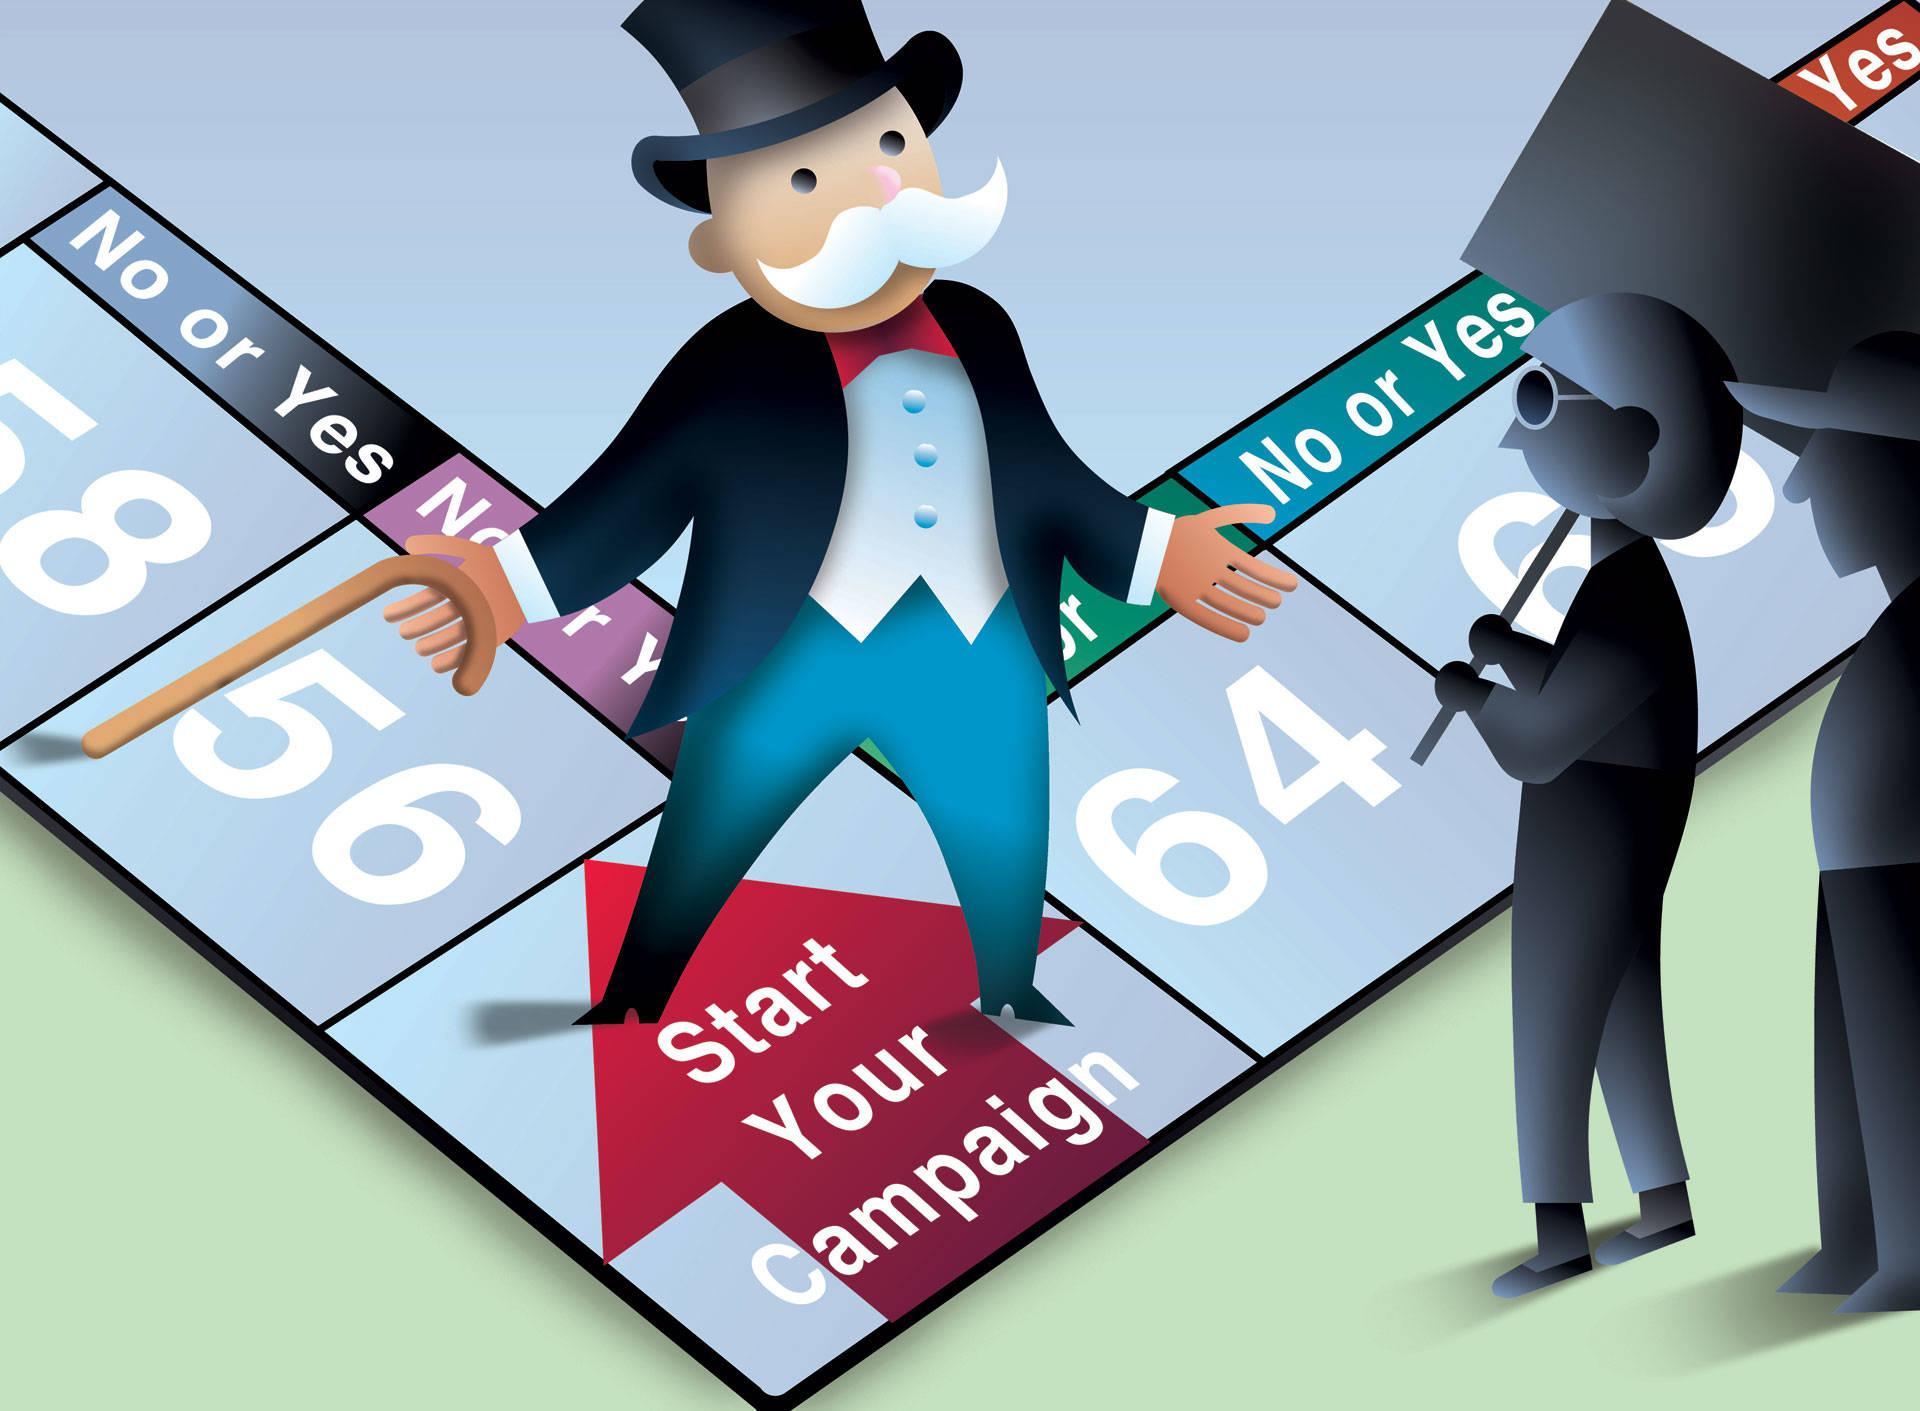 Domain name landlords have cornered the market on valuable internet real estate. Image by Dan Hubig